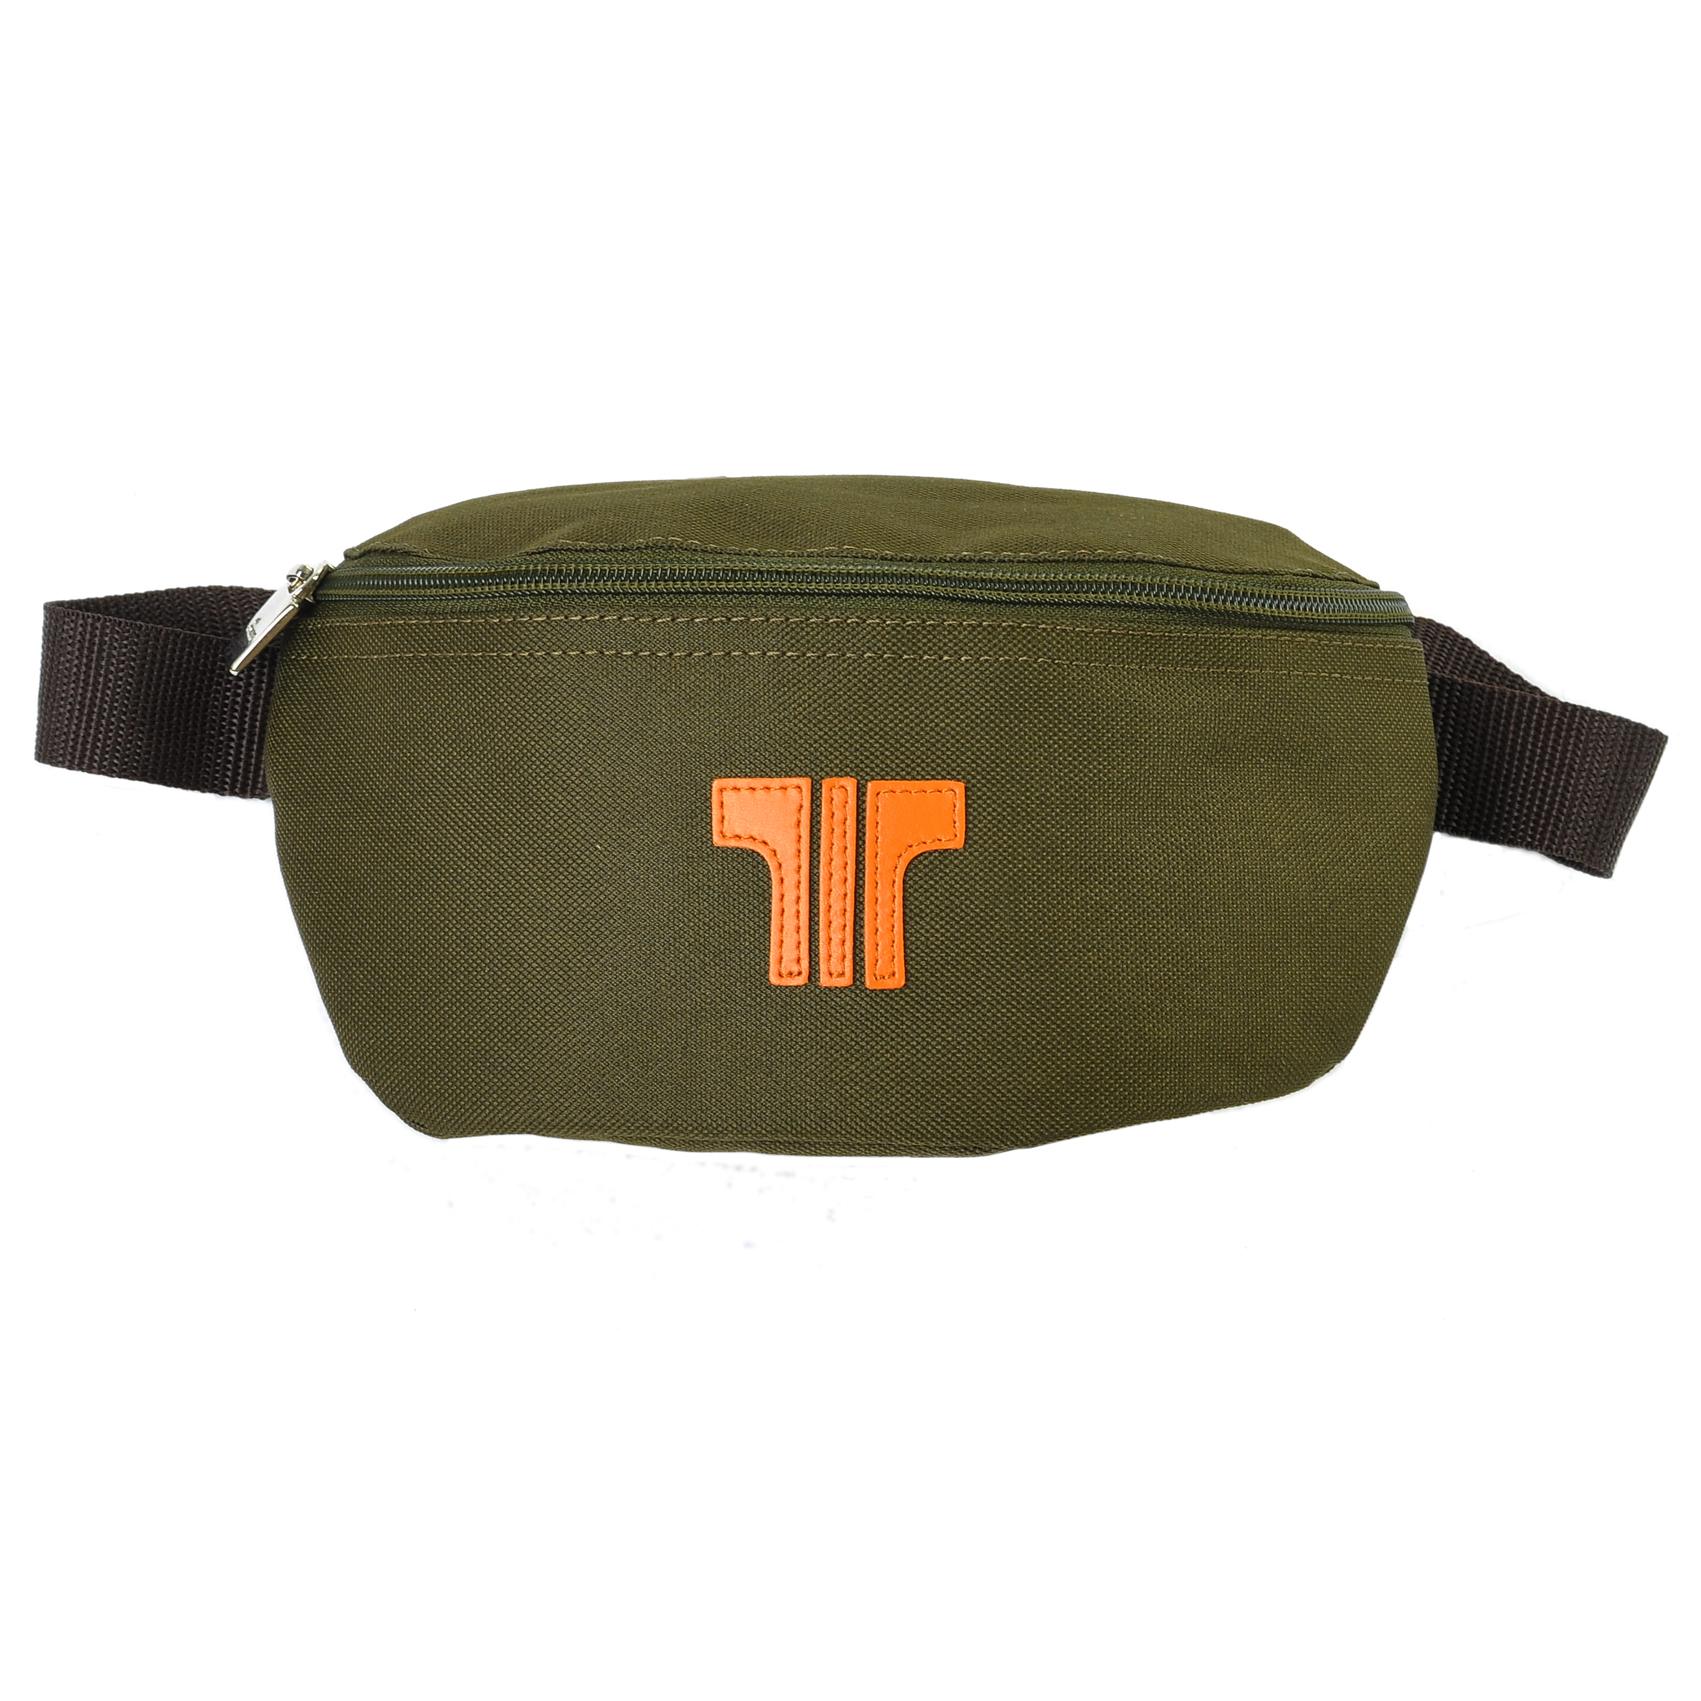 Tisza shoes - Belt pack - Green-orange